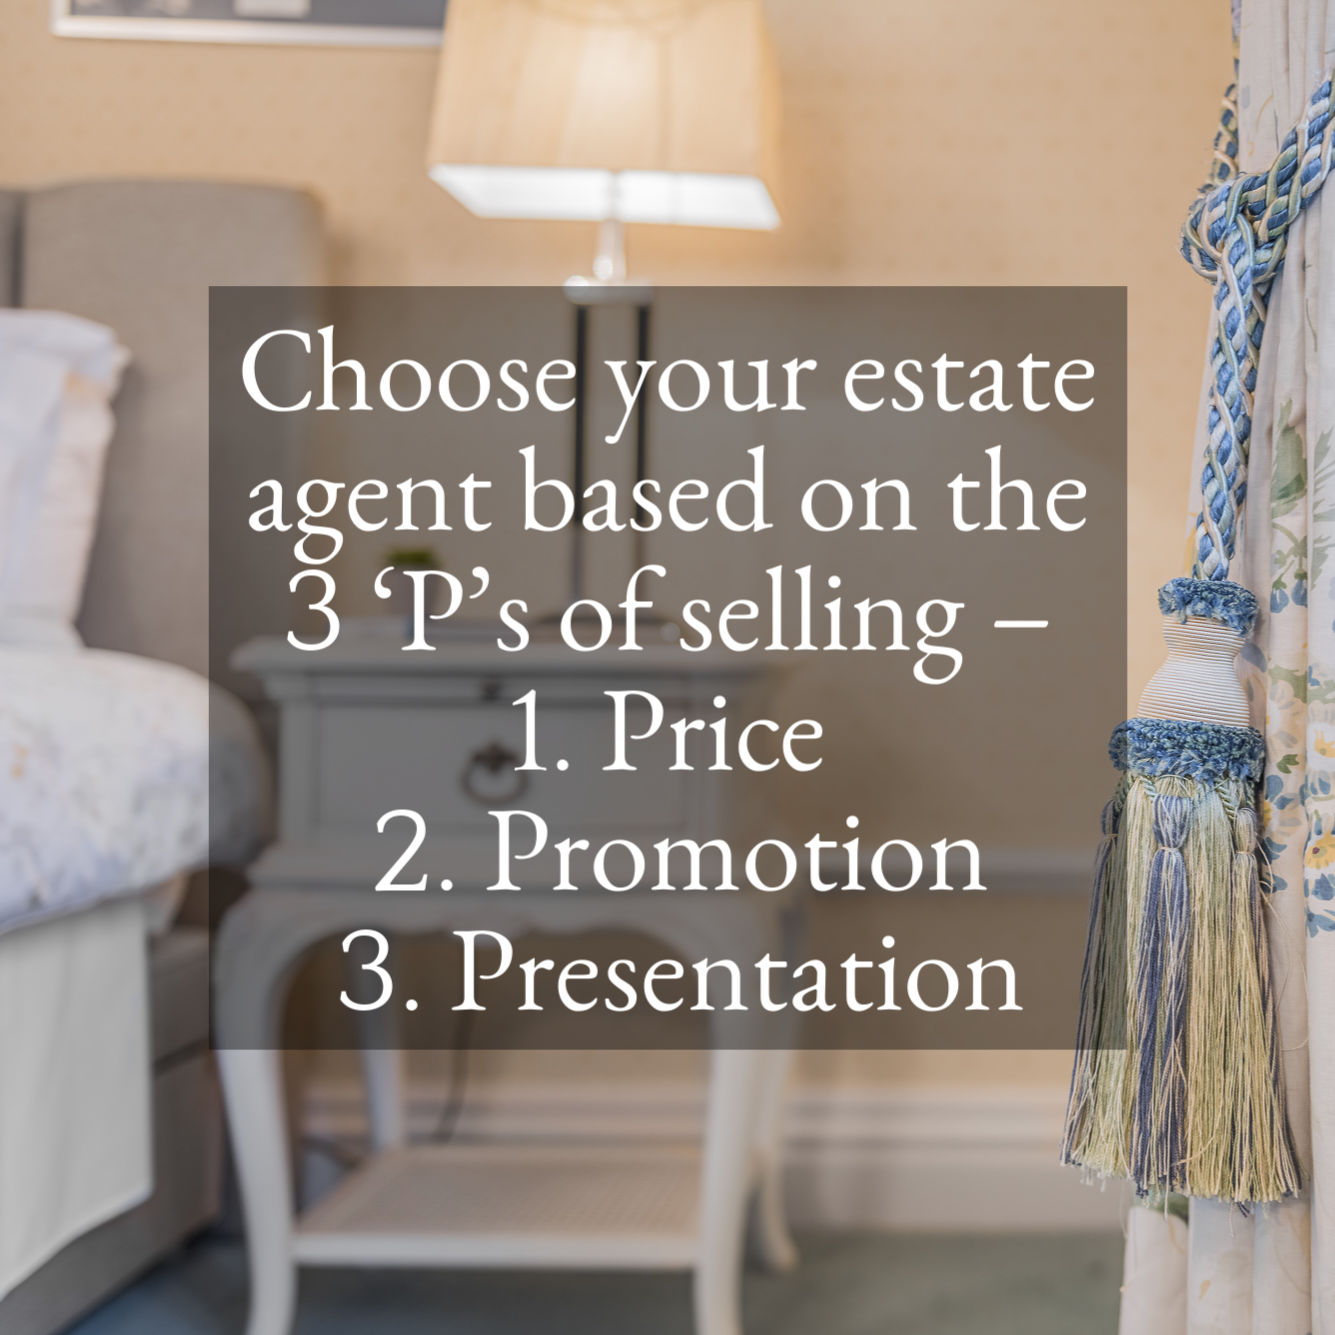 tg1-choose-your-estate-agent